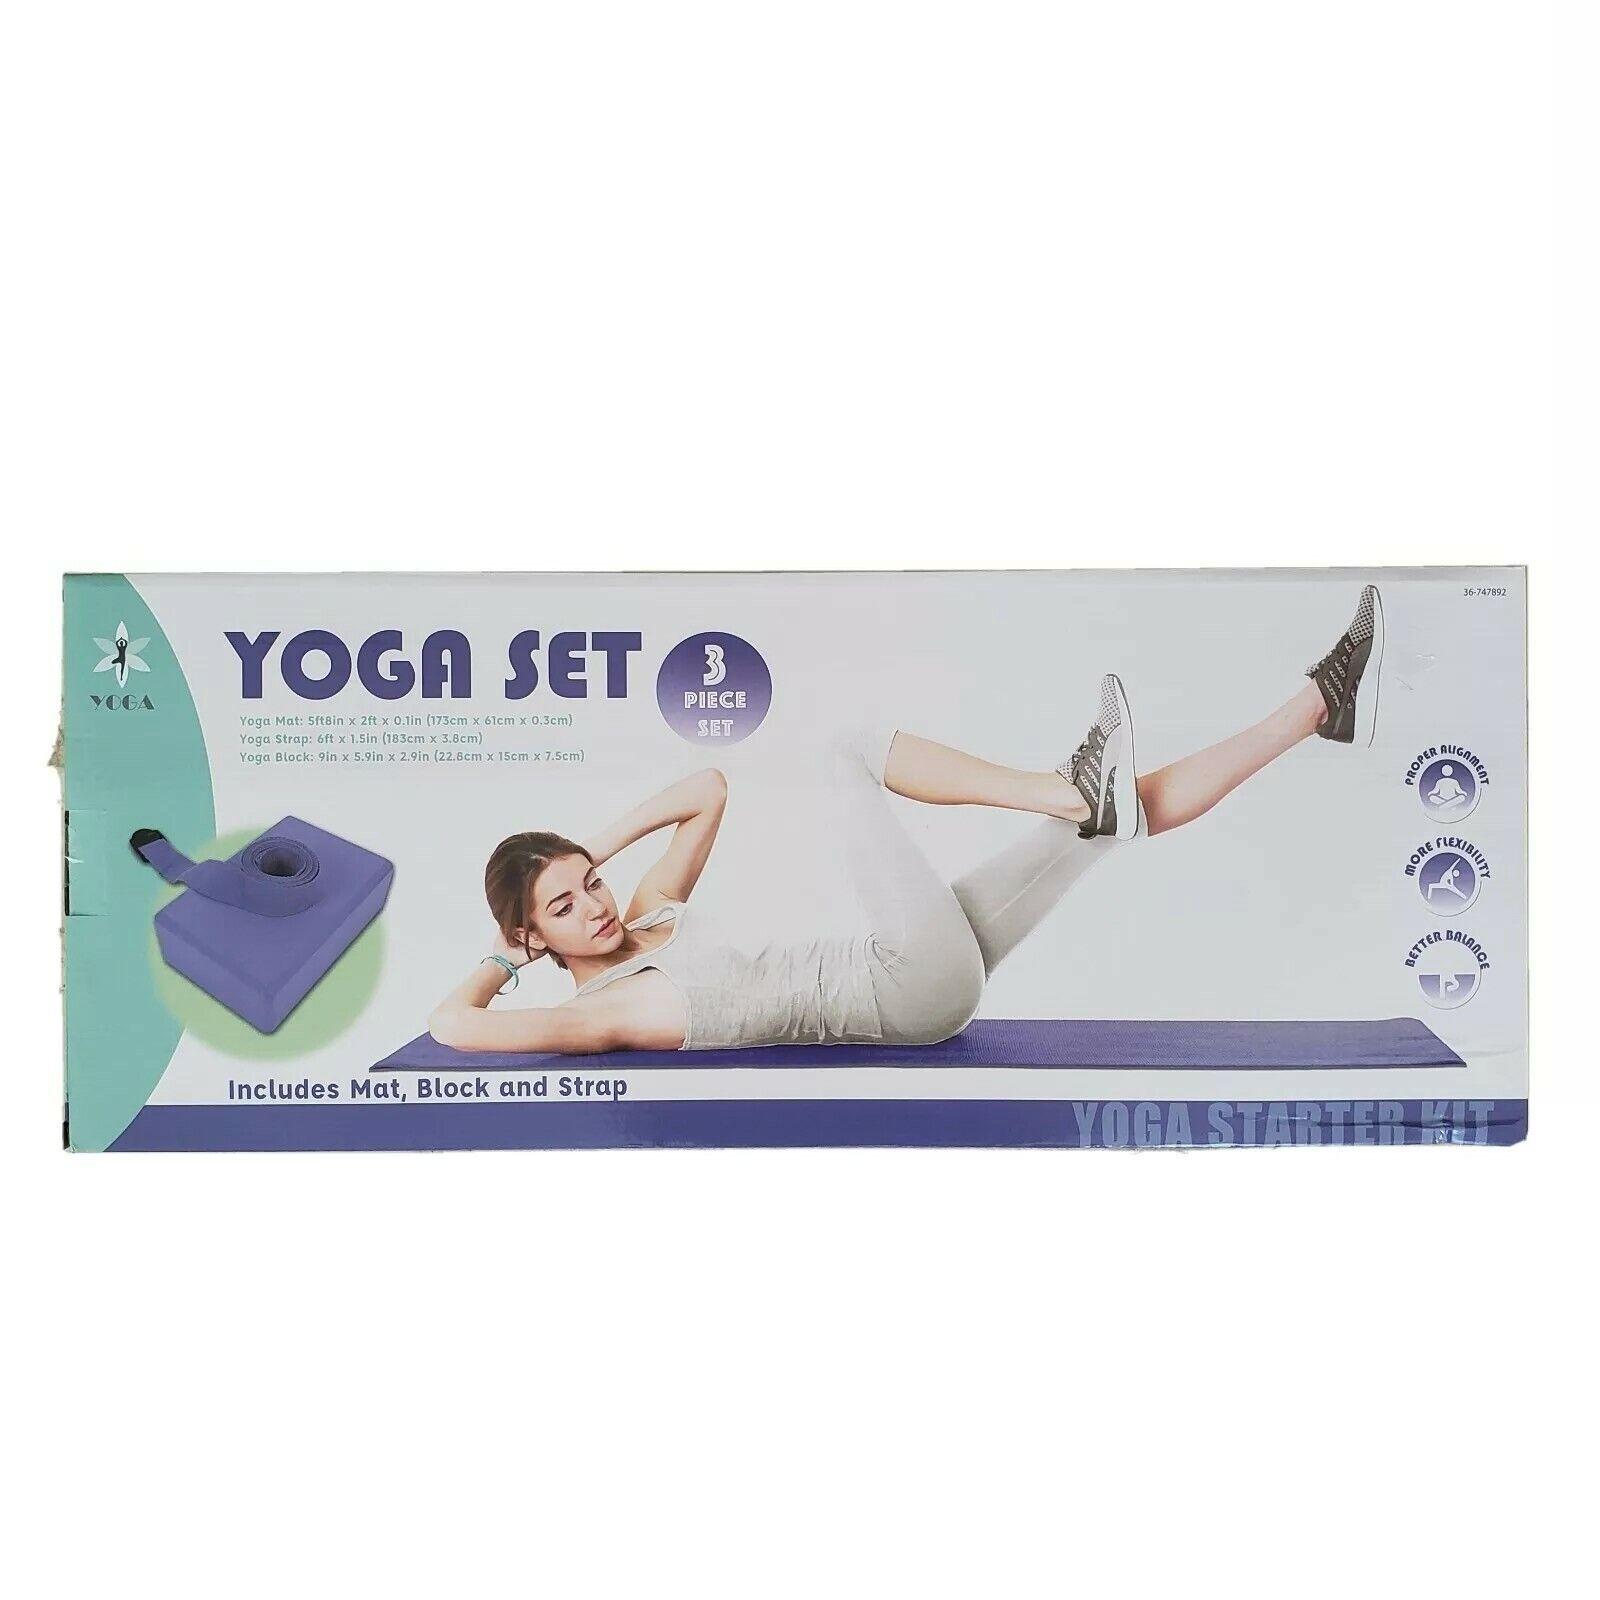 (2) Beginners Yoga Starter Kits (Yoga Mat, Yoga Block, Yoga Strap) 3 Piece Set.